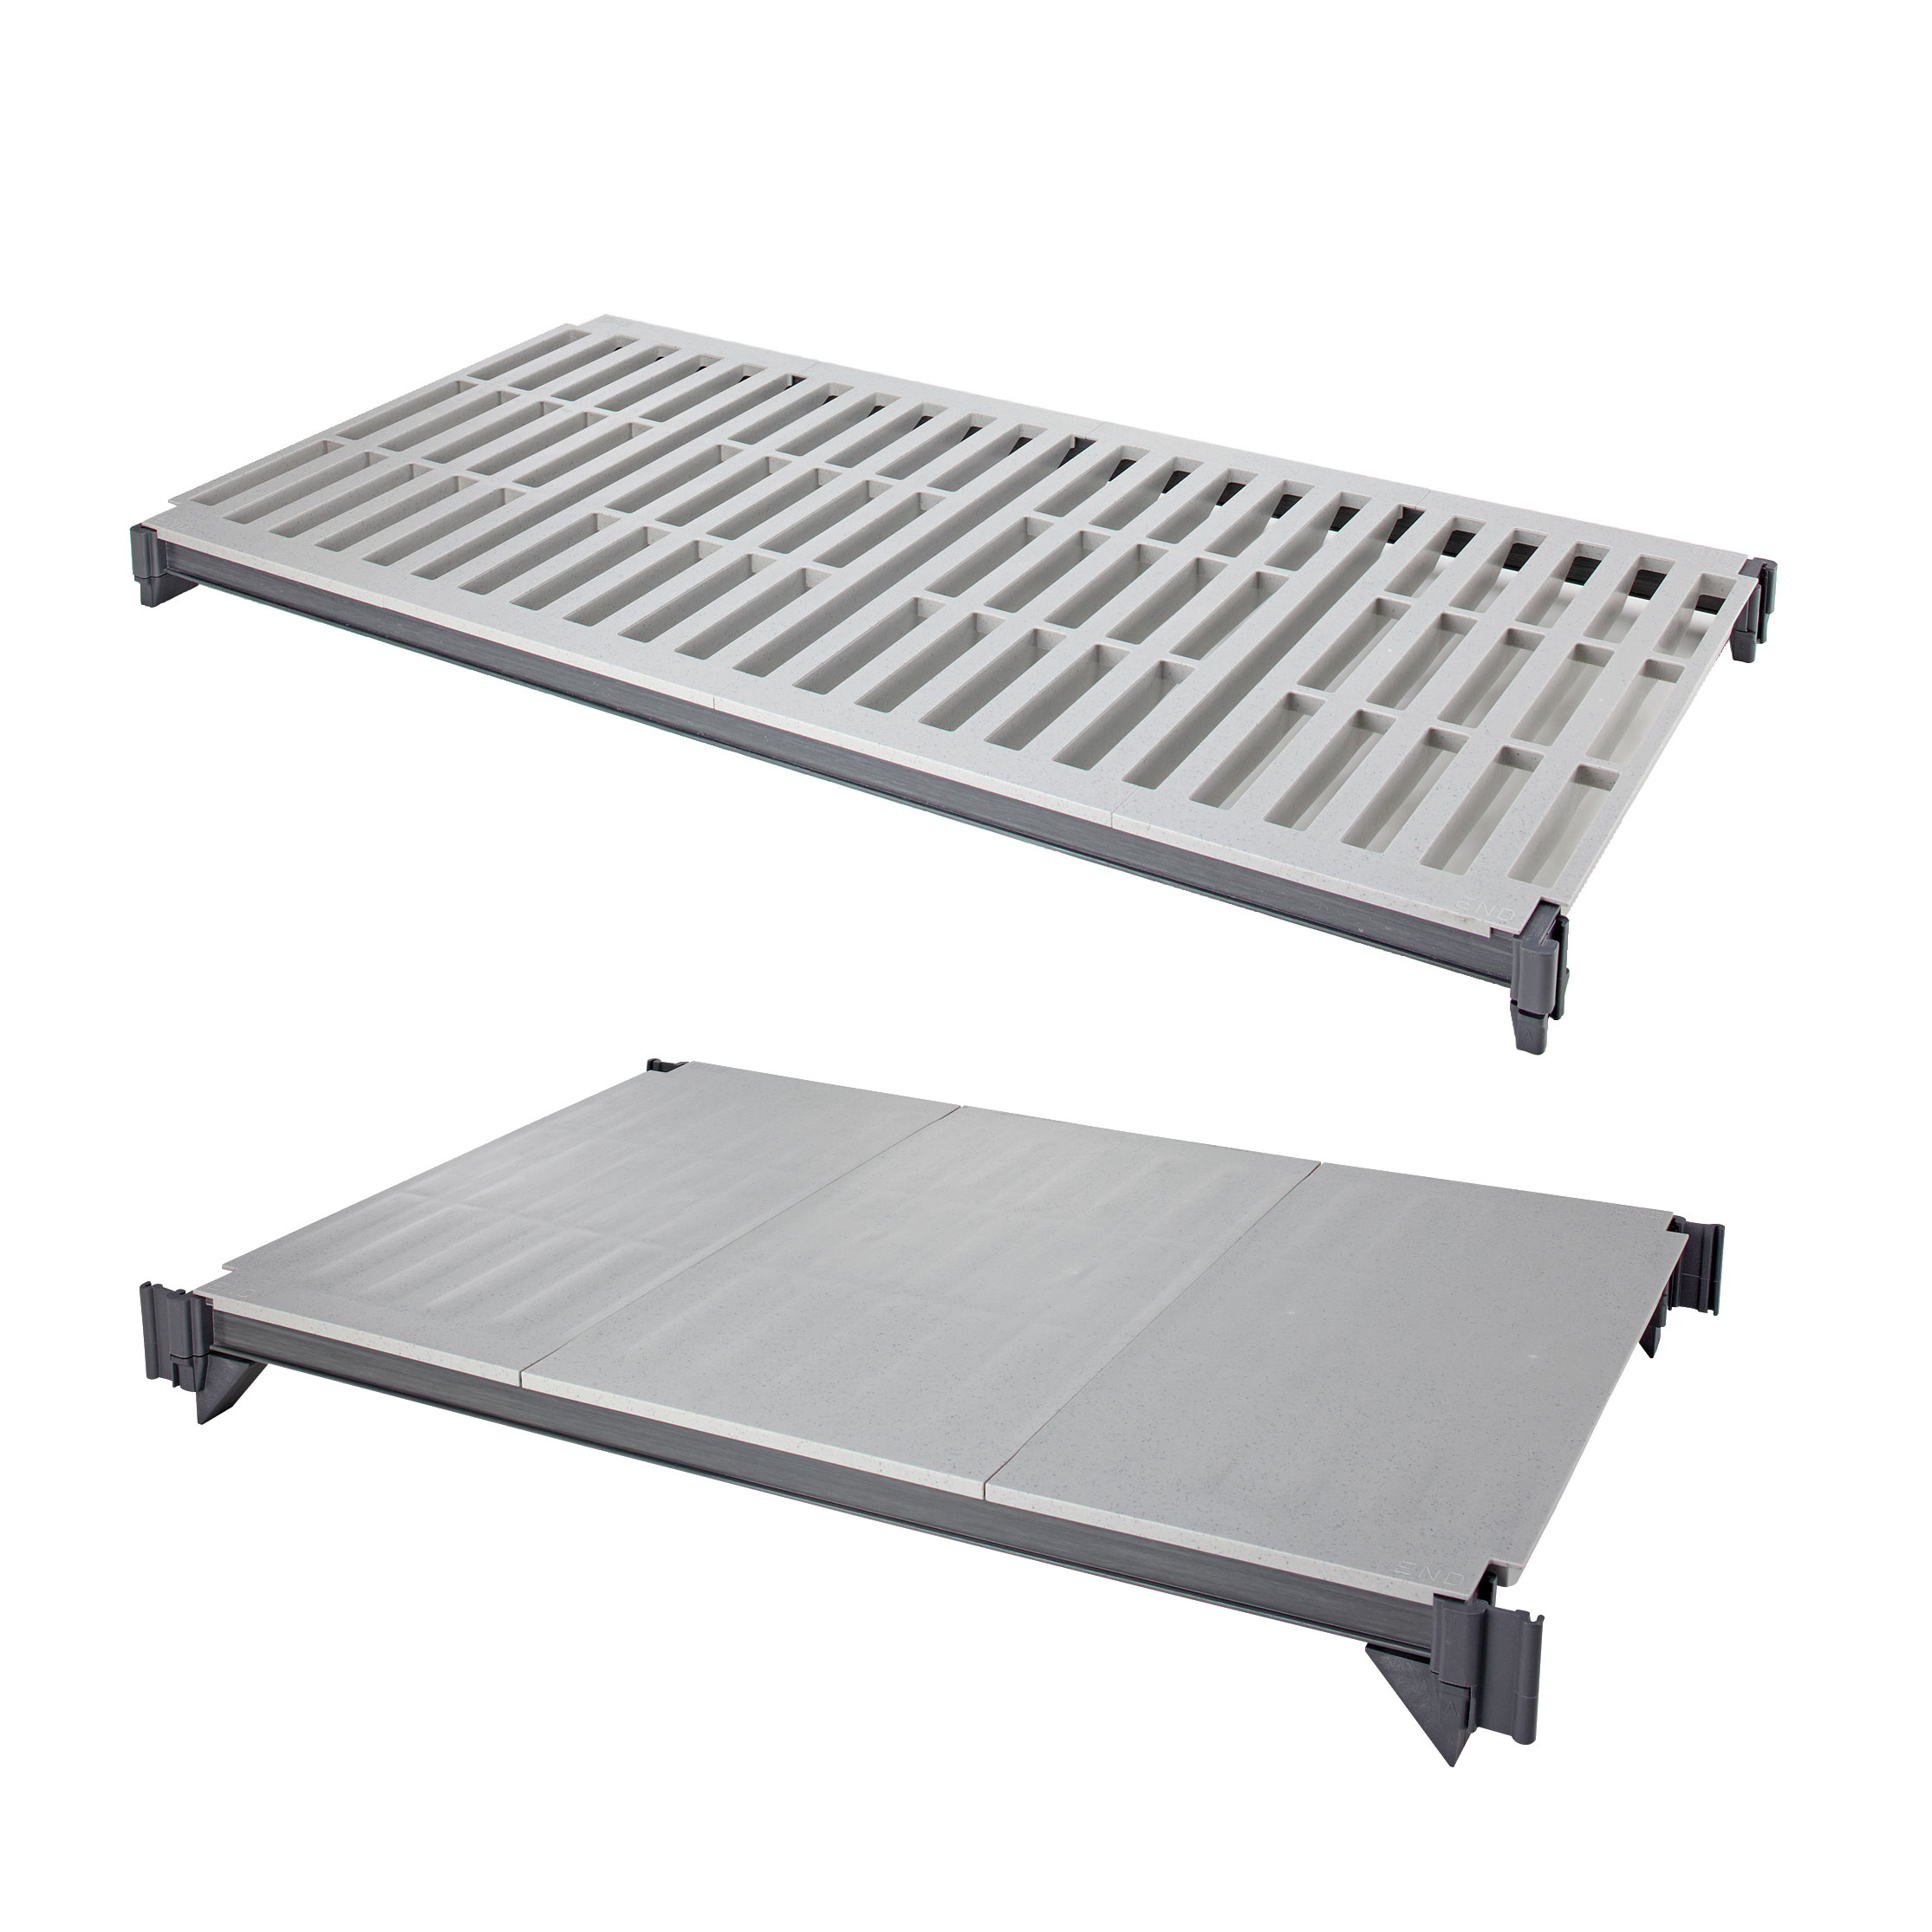 Cambro ESK1842VS4580 shelving/shelving systems